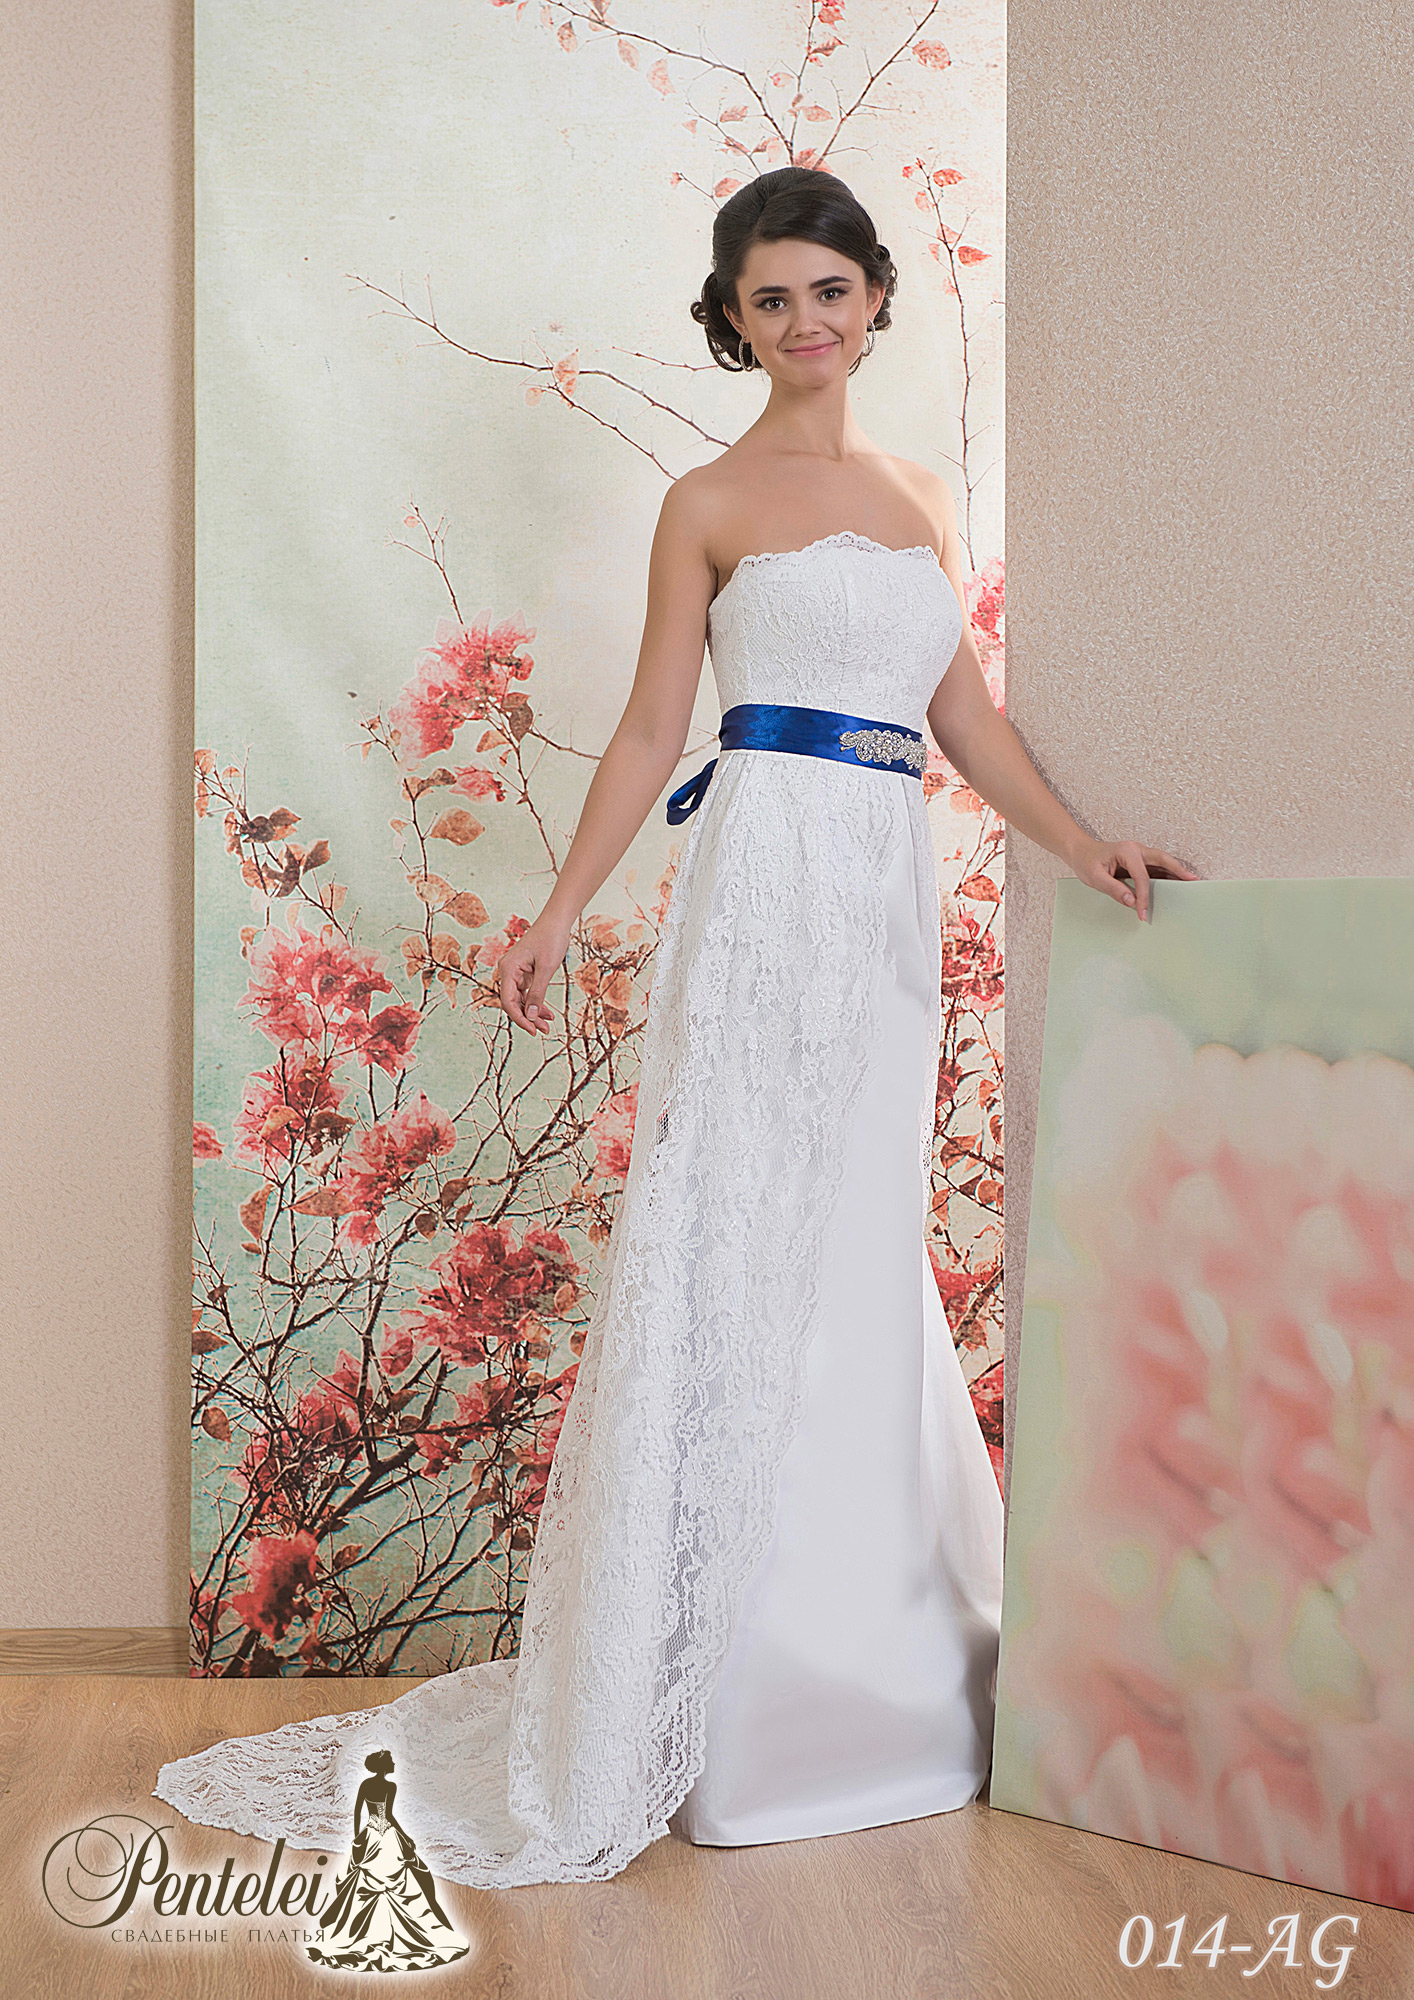 014-AG | Cumpăra rochii de mireasă en-gros de Pentelei